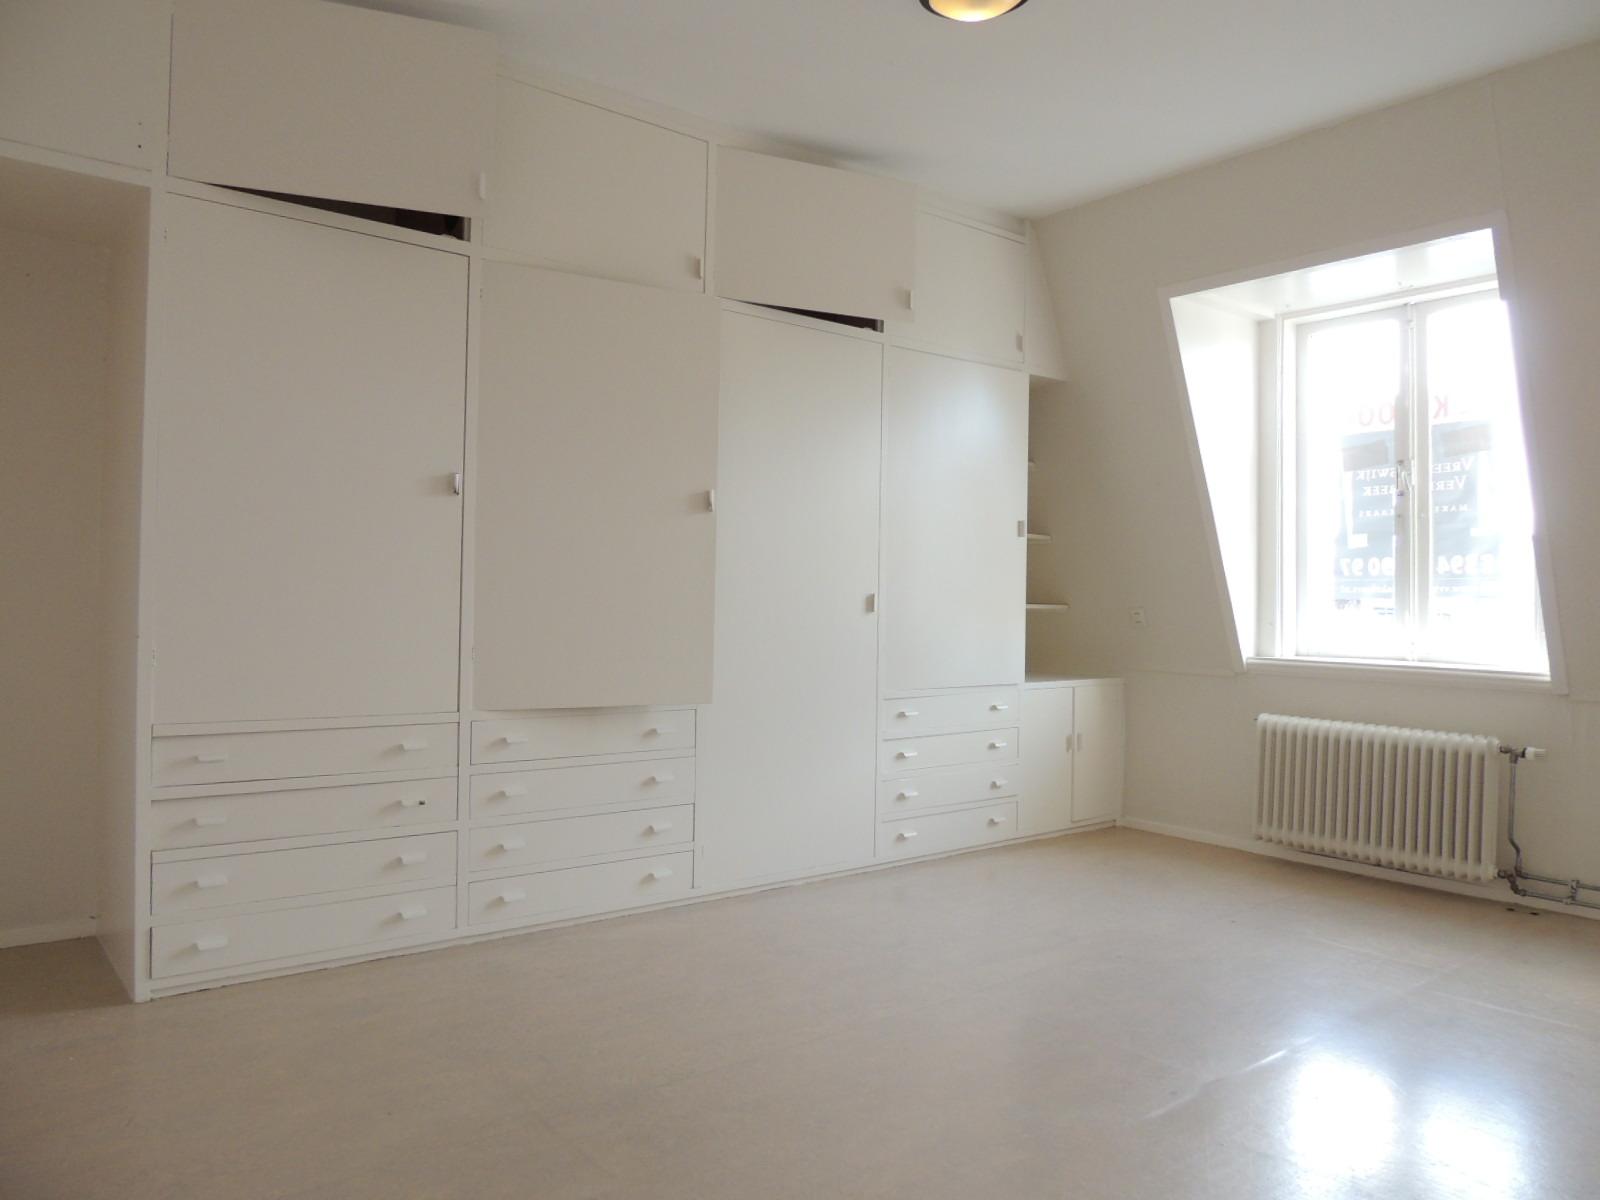 Beeklaan top floor 2br apartment furnished, The Hague